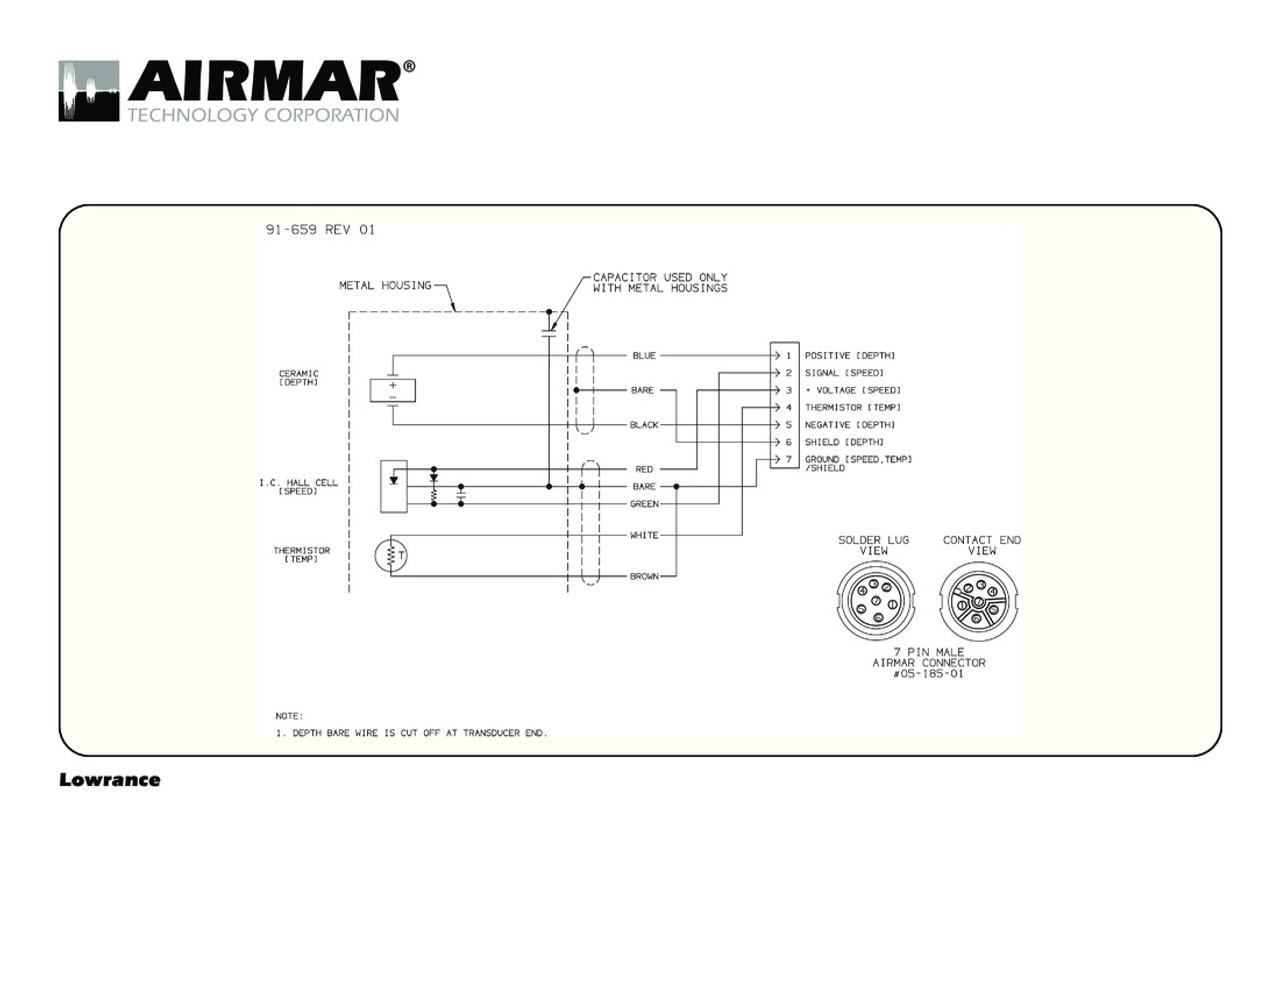 airmar wiring diagram lowrance 7 pin (d,s,t) blue bottle Lowrance NMEA 2000 Wiring Diagram